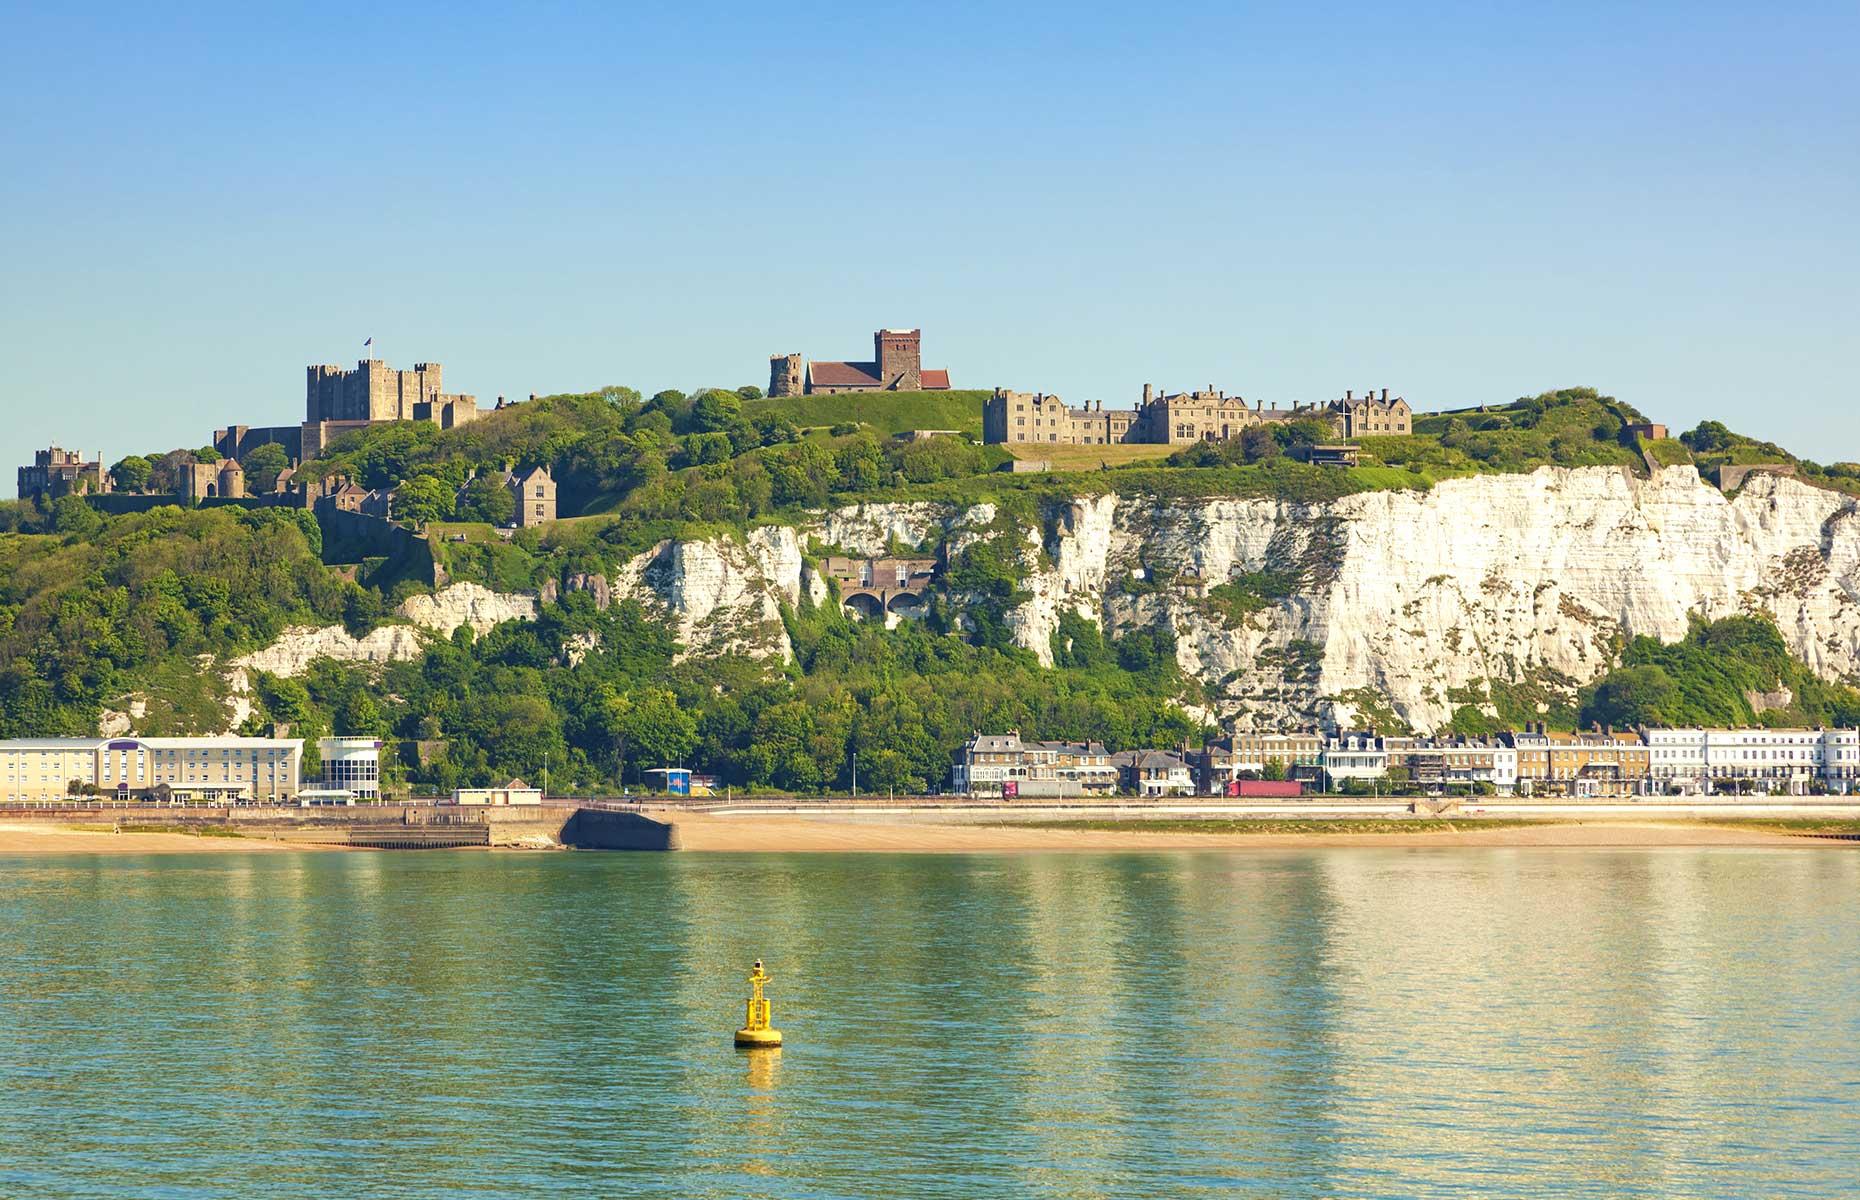 White Cliffs of Dover and Dover Caste (Image: Oliver Hoffmann/Shutterstock)